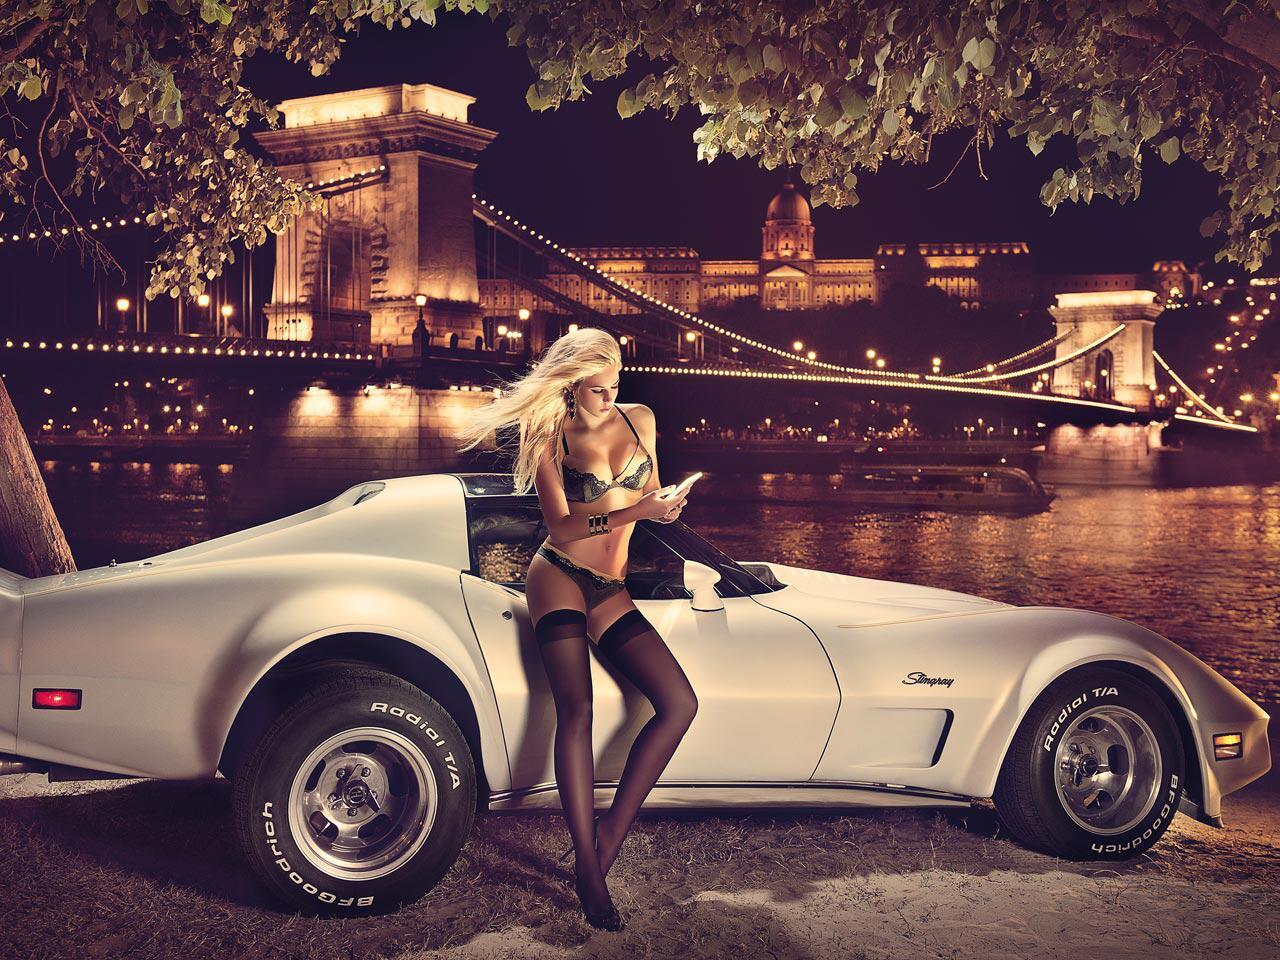 Bild zu Tuning-Kalender 2014: Leonie Hagmeyer-Reyinger in Budapest